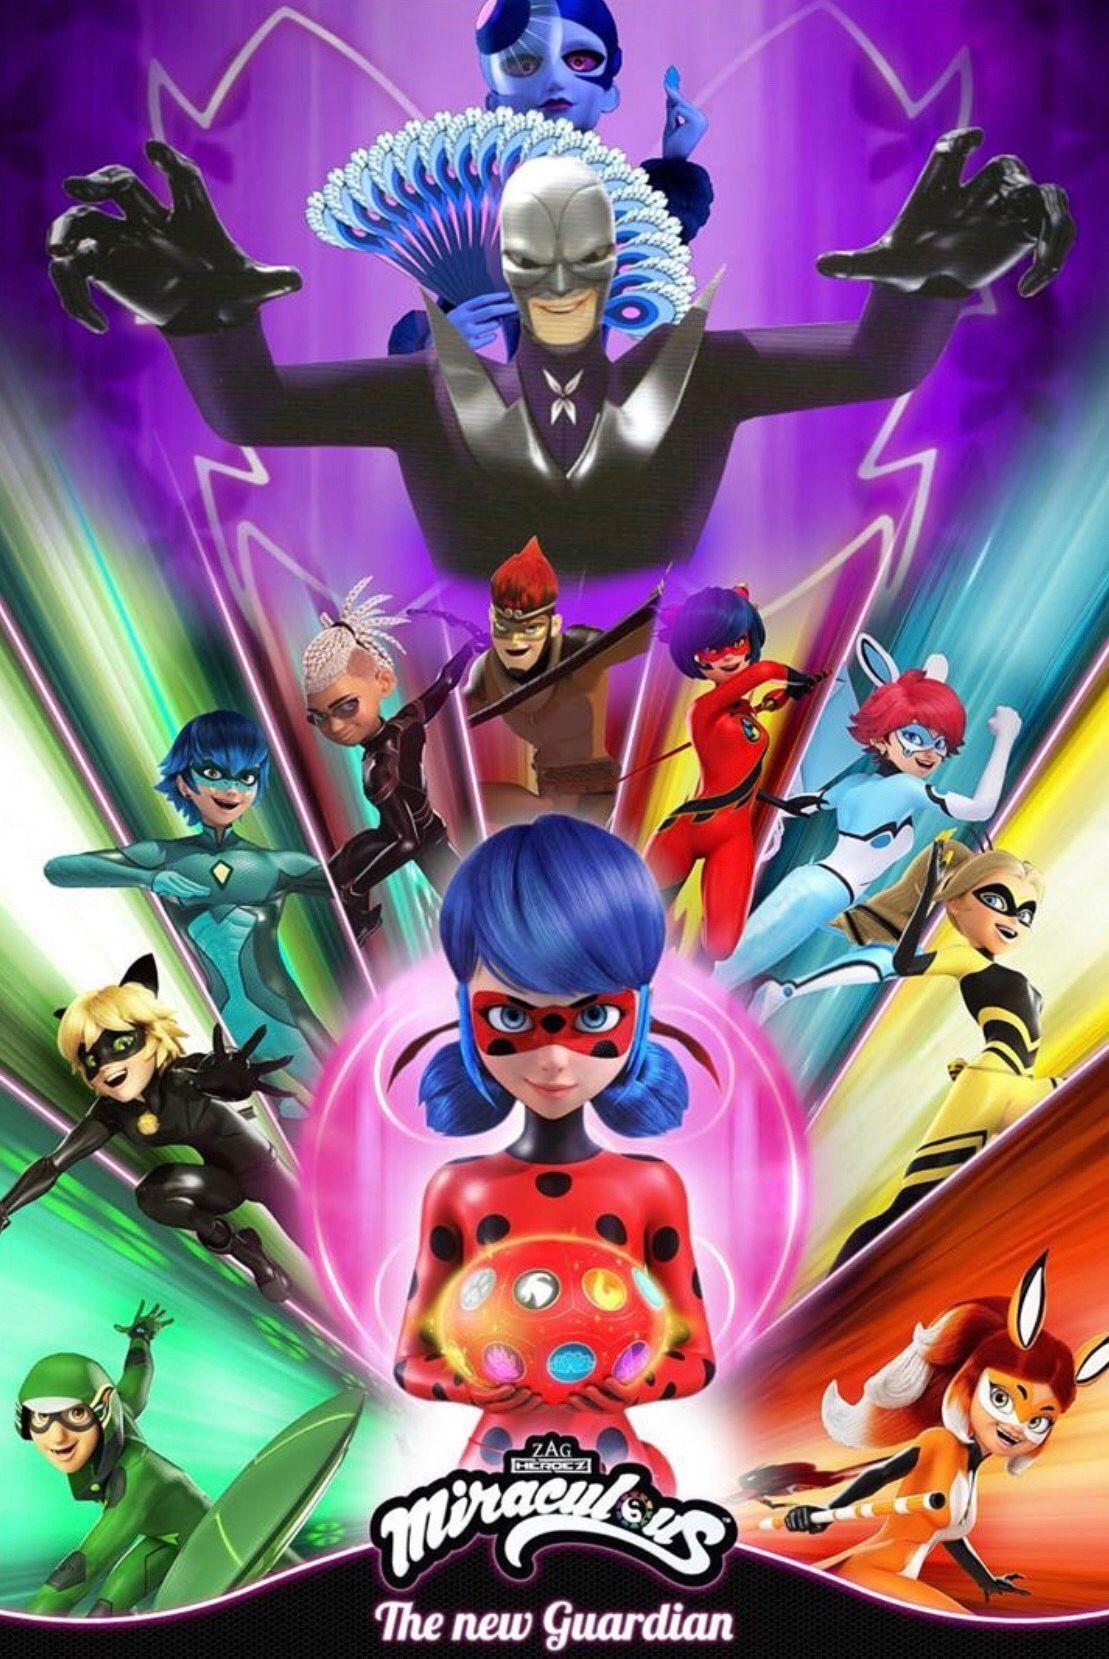 Miraculous Season 4 Desenhos Para Colorir Ladybug Desenhos Animados De Menina Wallpaper De Desenhos Animados